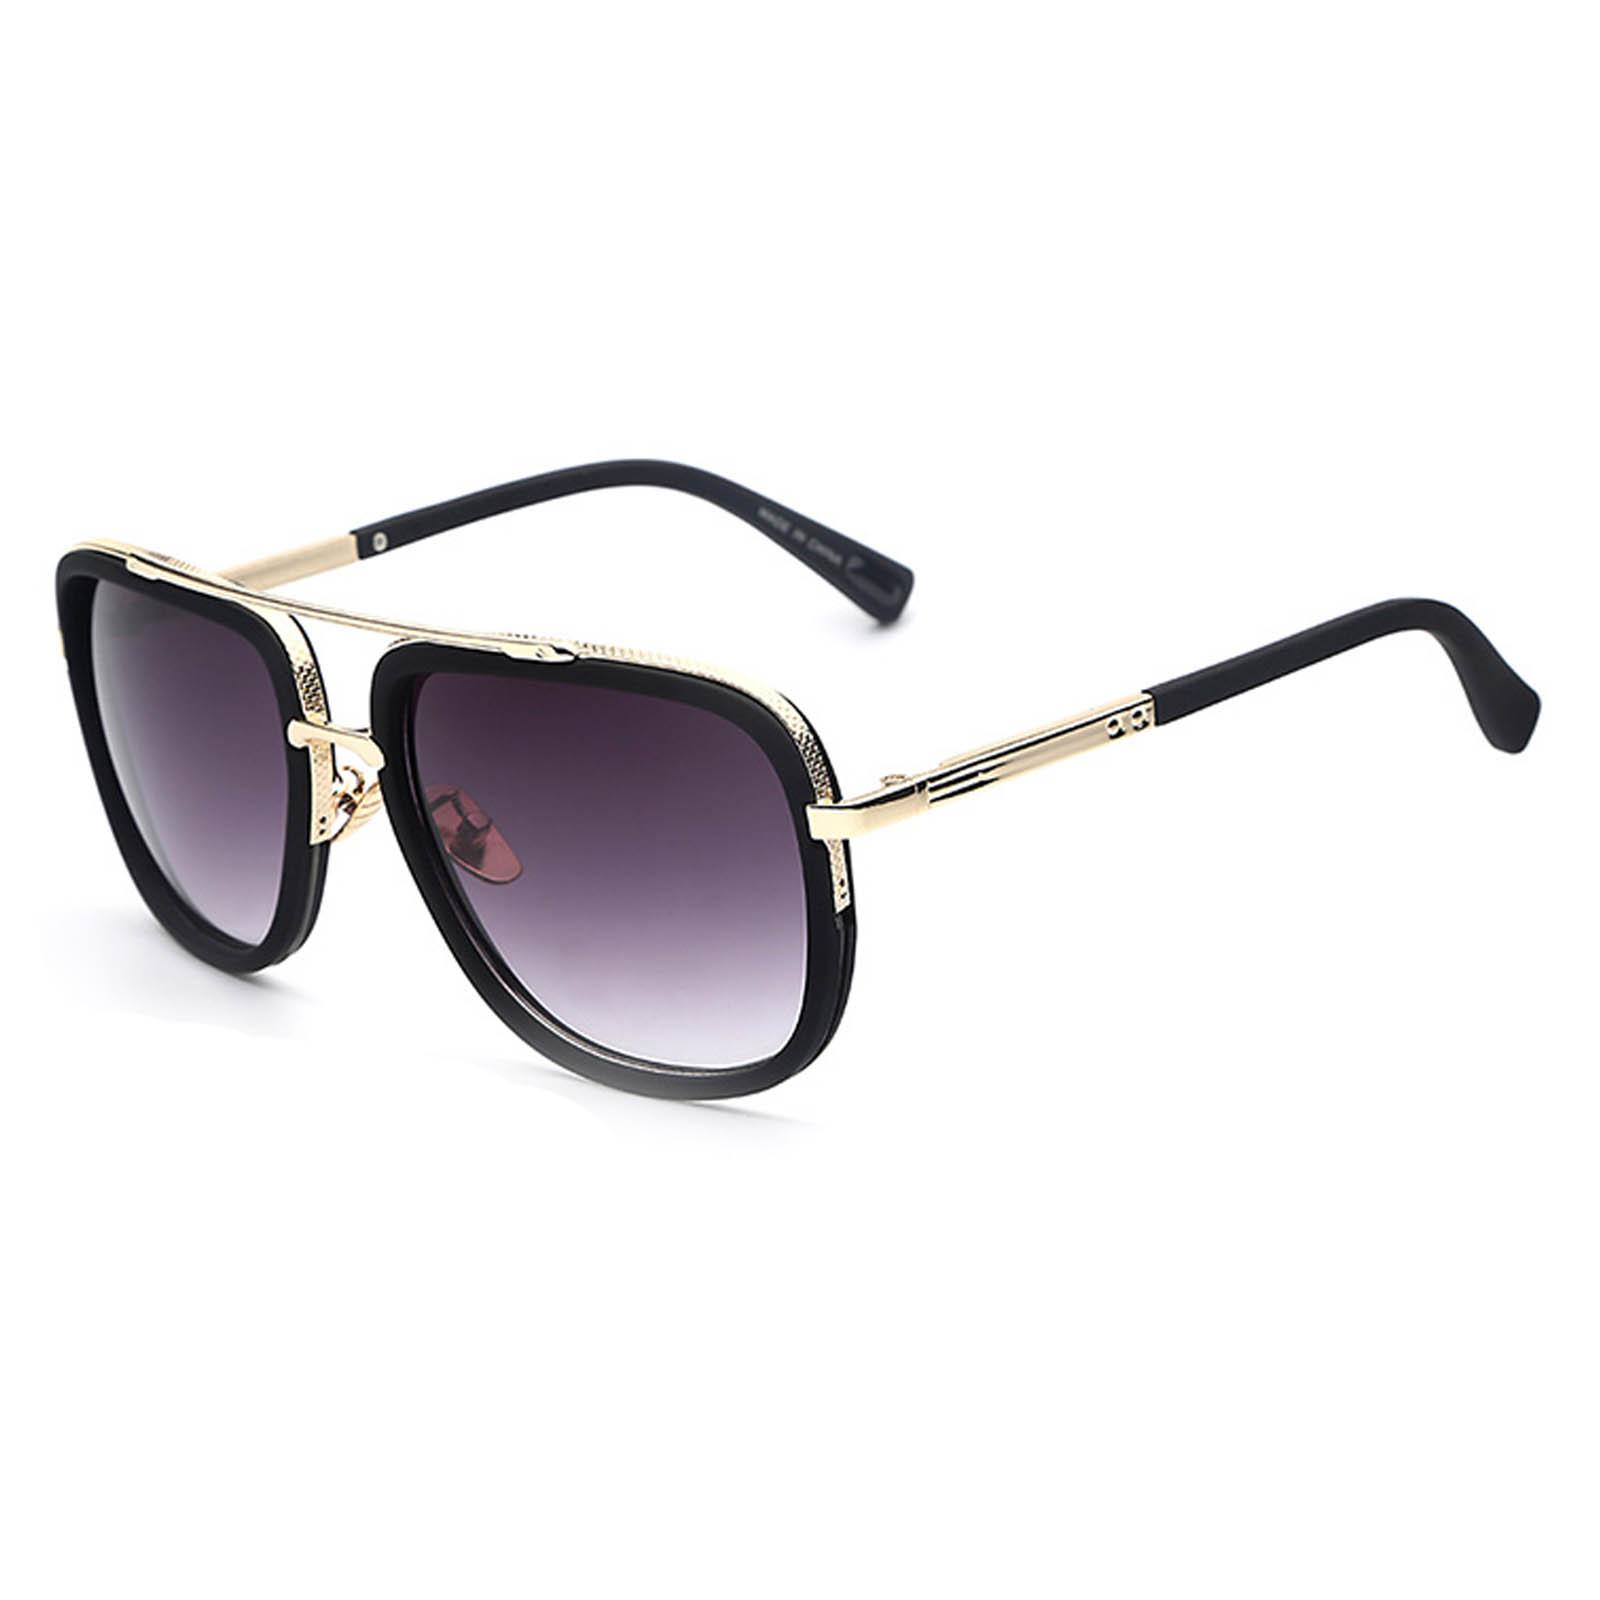 OWL ® 011 C3 Aviator Eyewear Sunglasses Women's Men's Metal Black Frame Smoke Lens One Pair